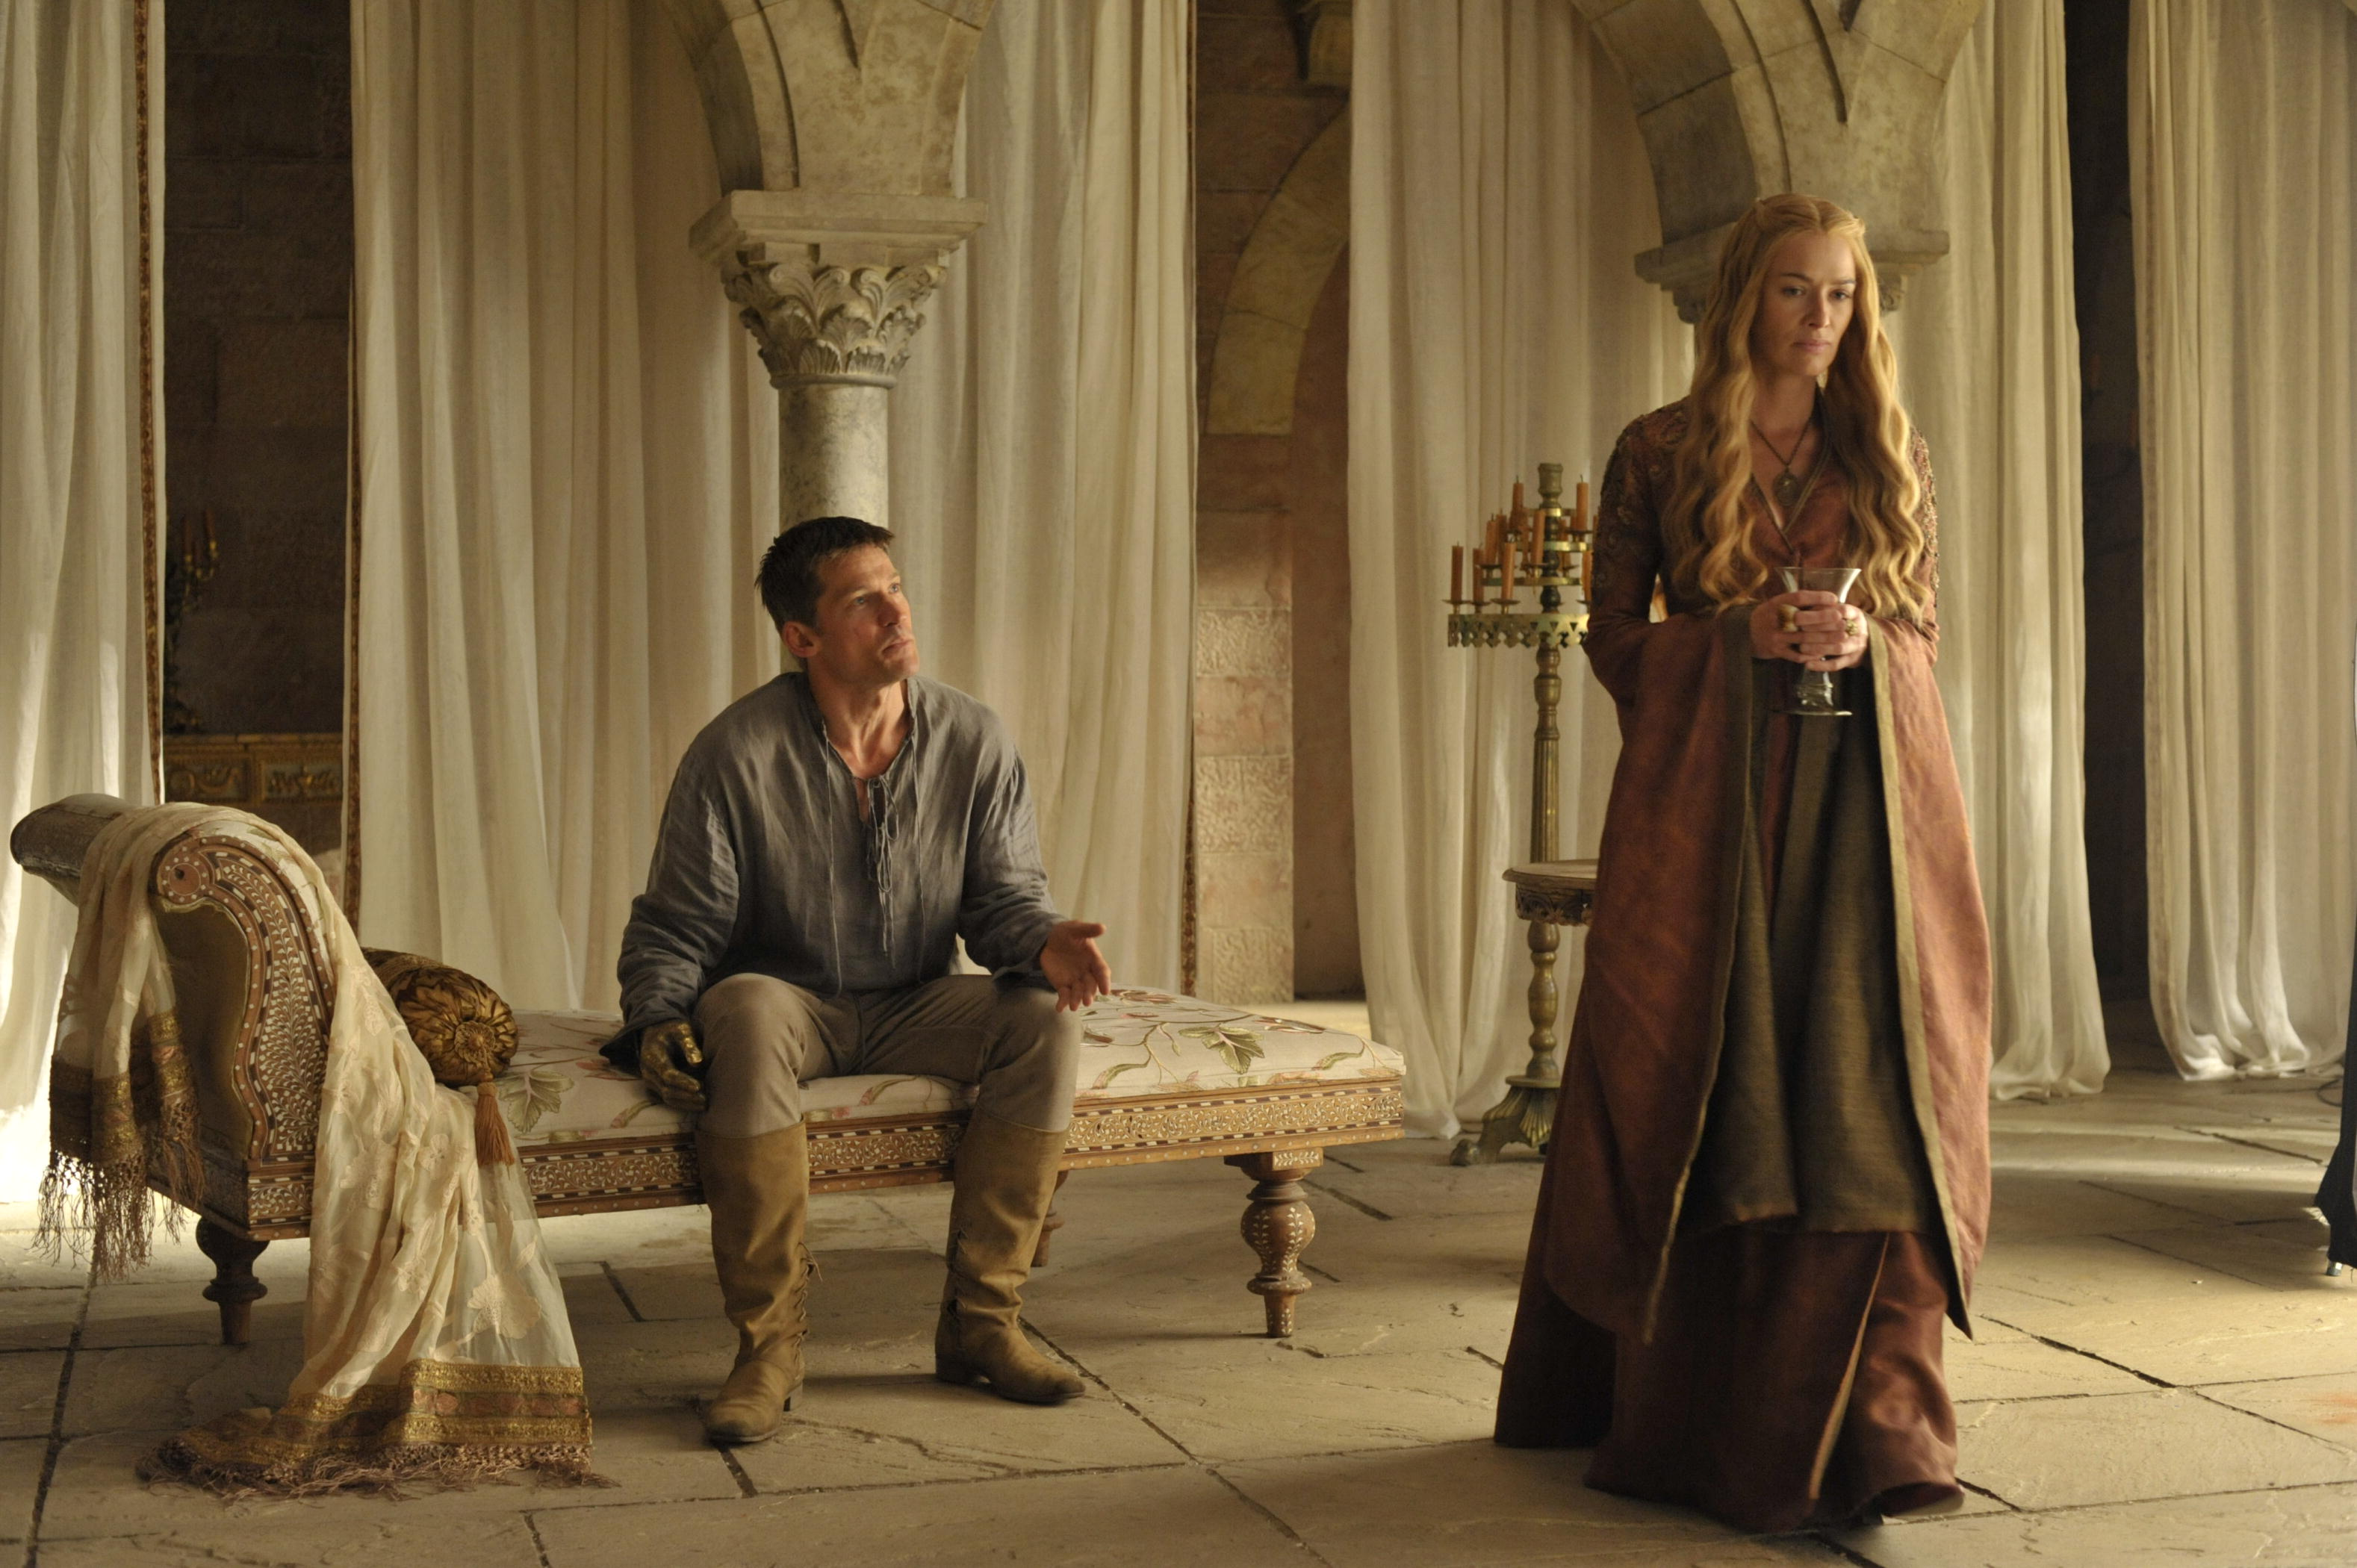 Game-of-Thrones-Season-4Nikolaj-Coster-Waldau-Jaime-Lannister-Lena-Headey-Cersei Lannister_HBO